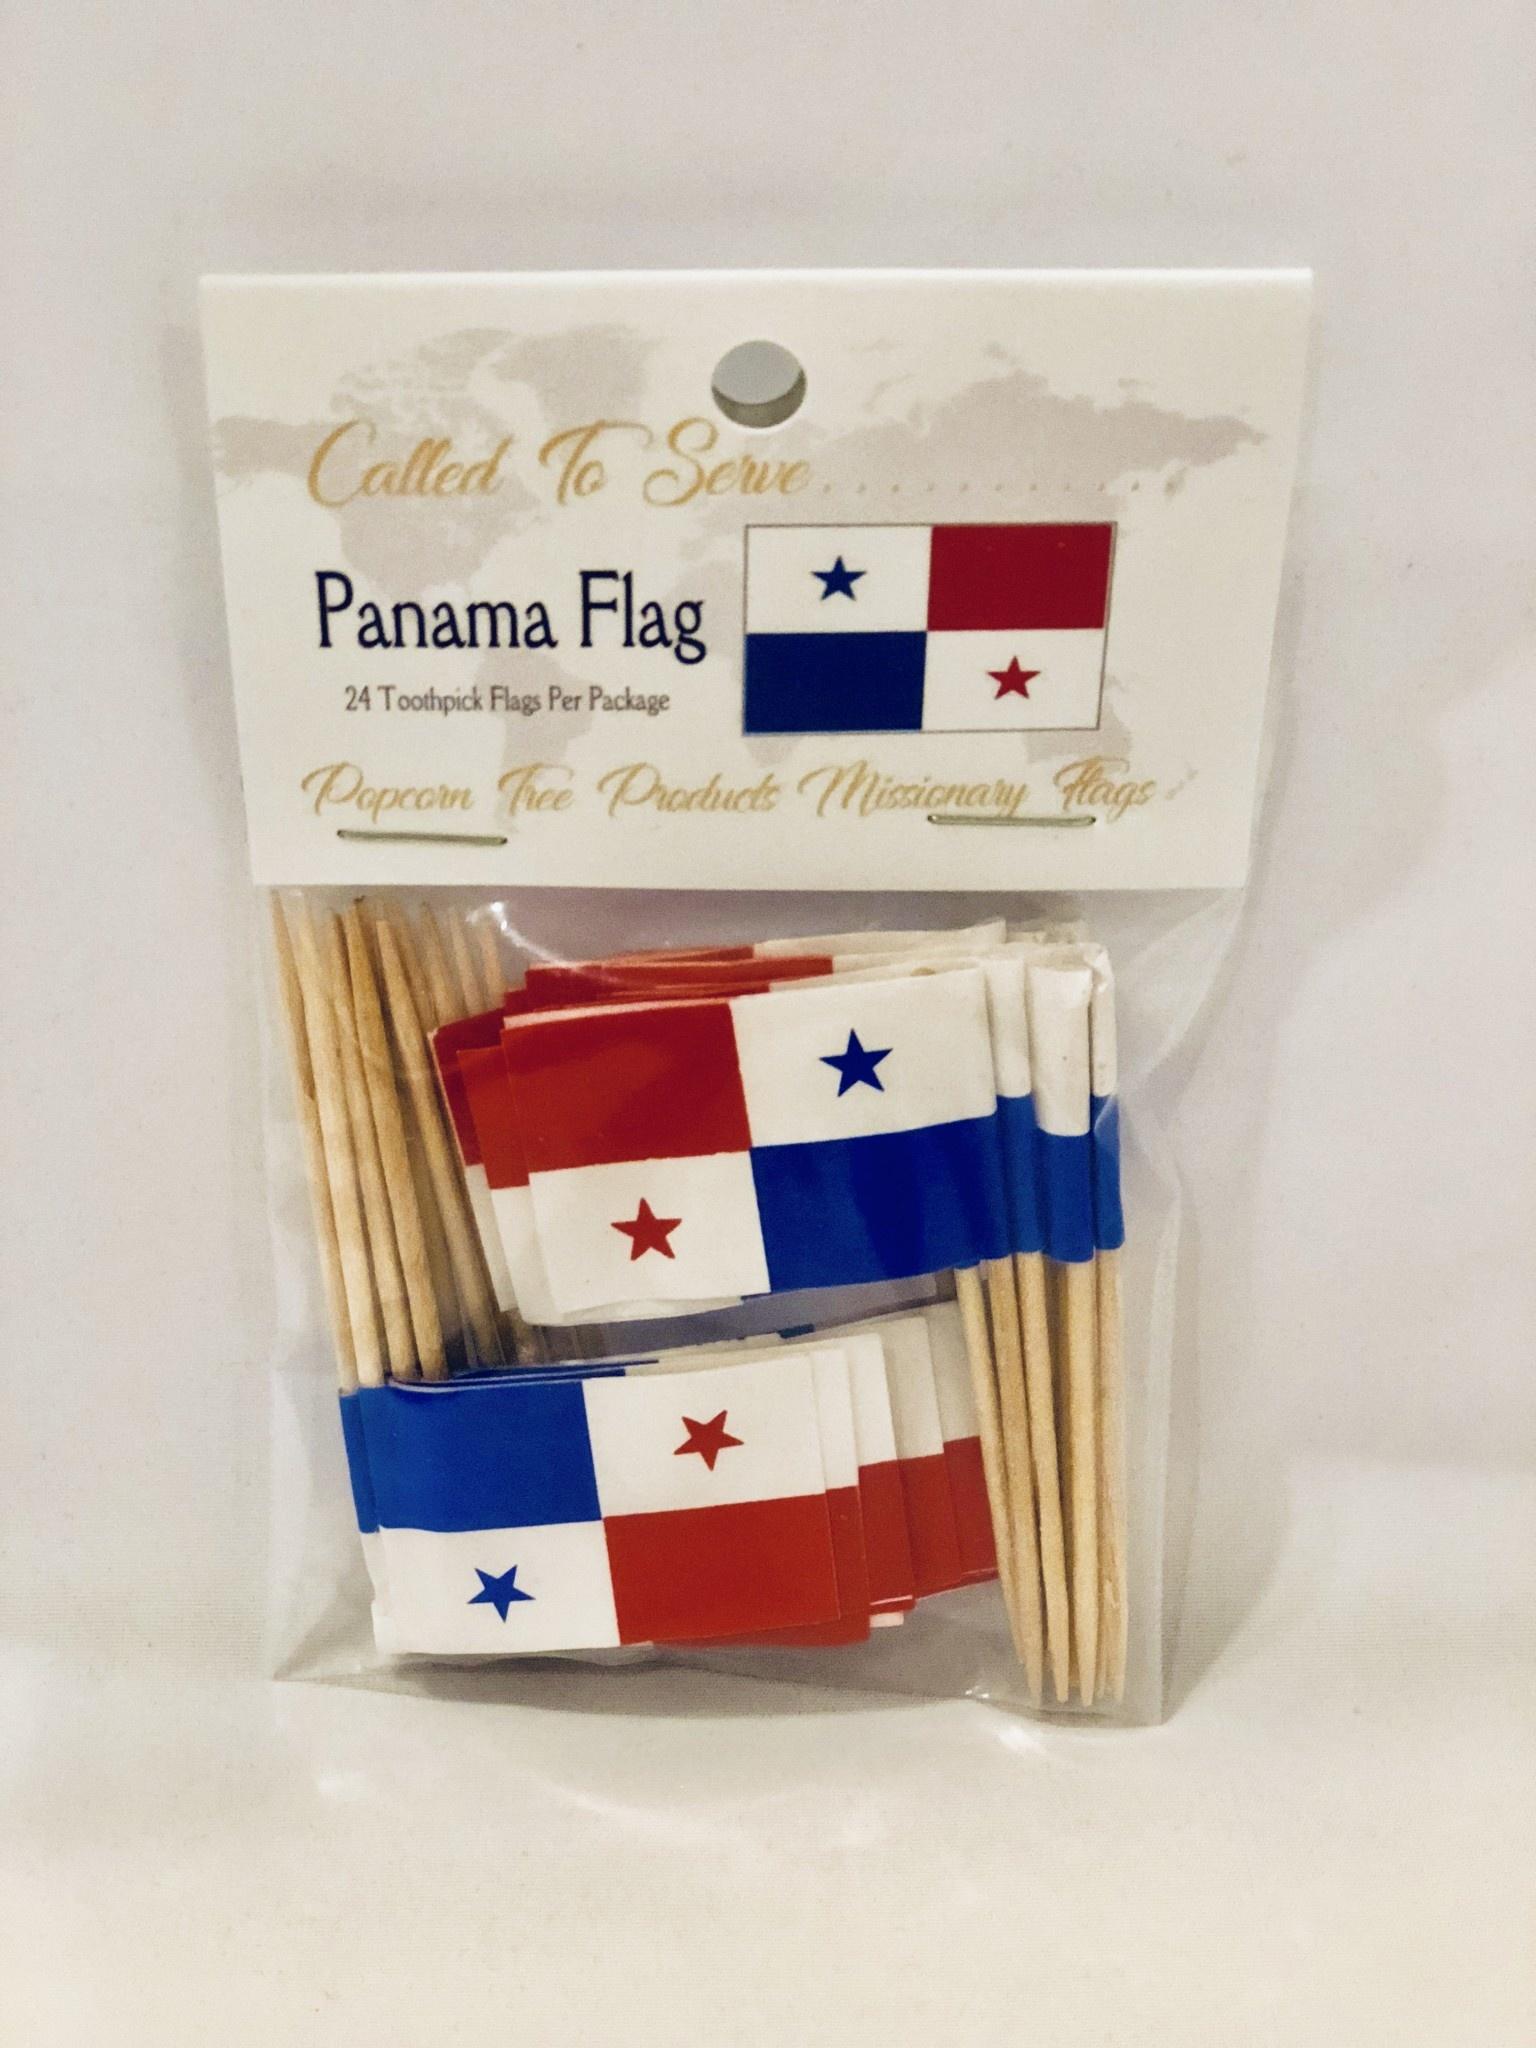 Toothpick Flags - Panama